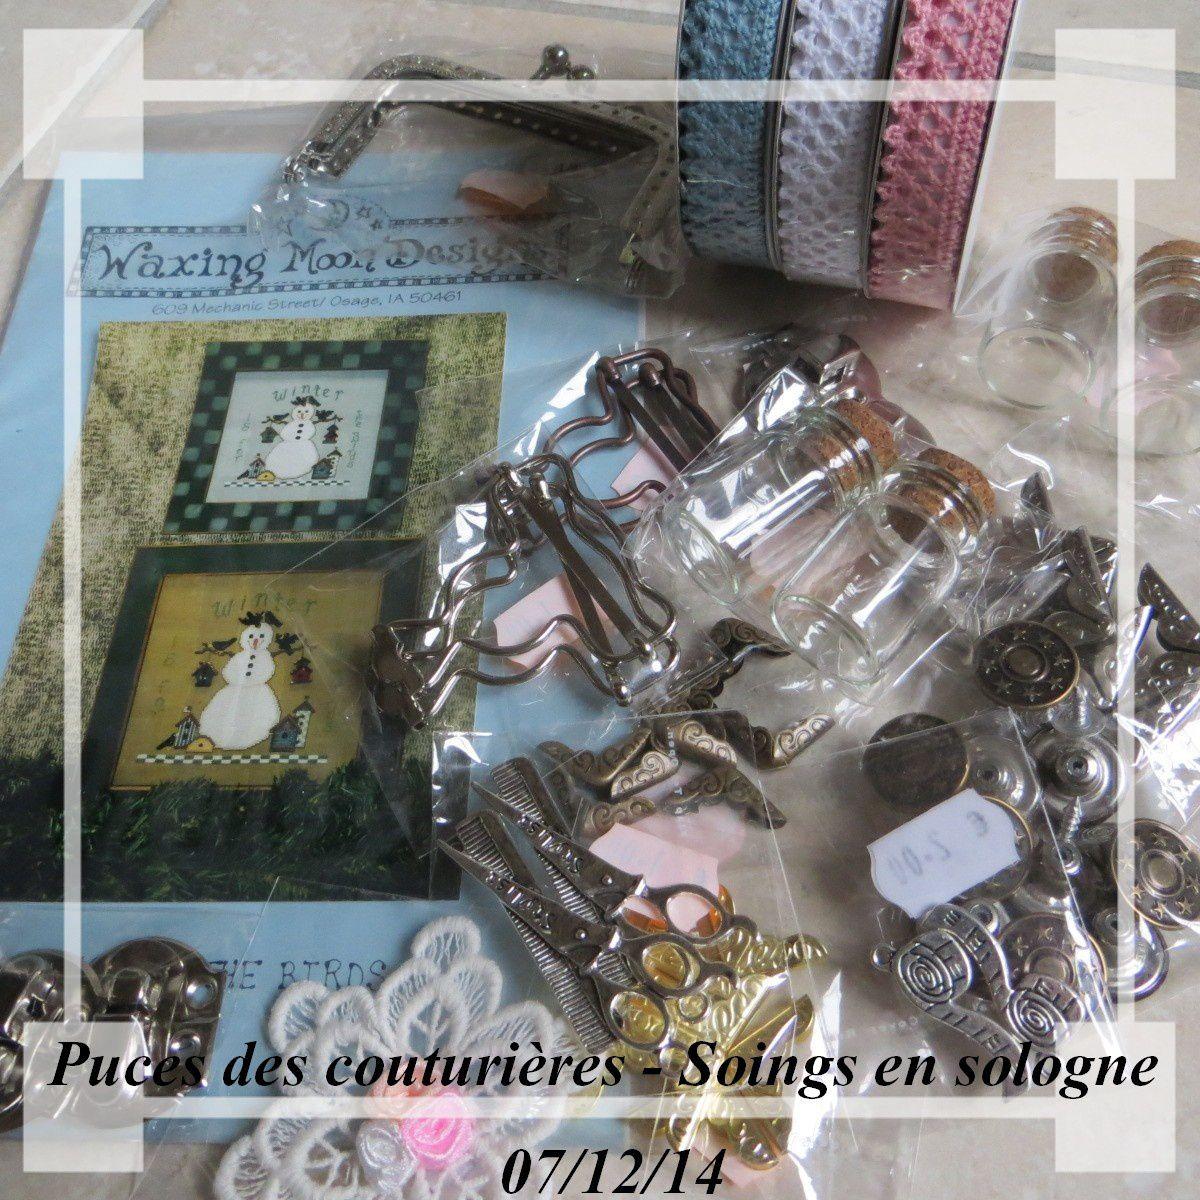 Petit Jeu de Noël chez Fibul + des news